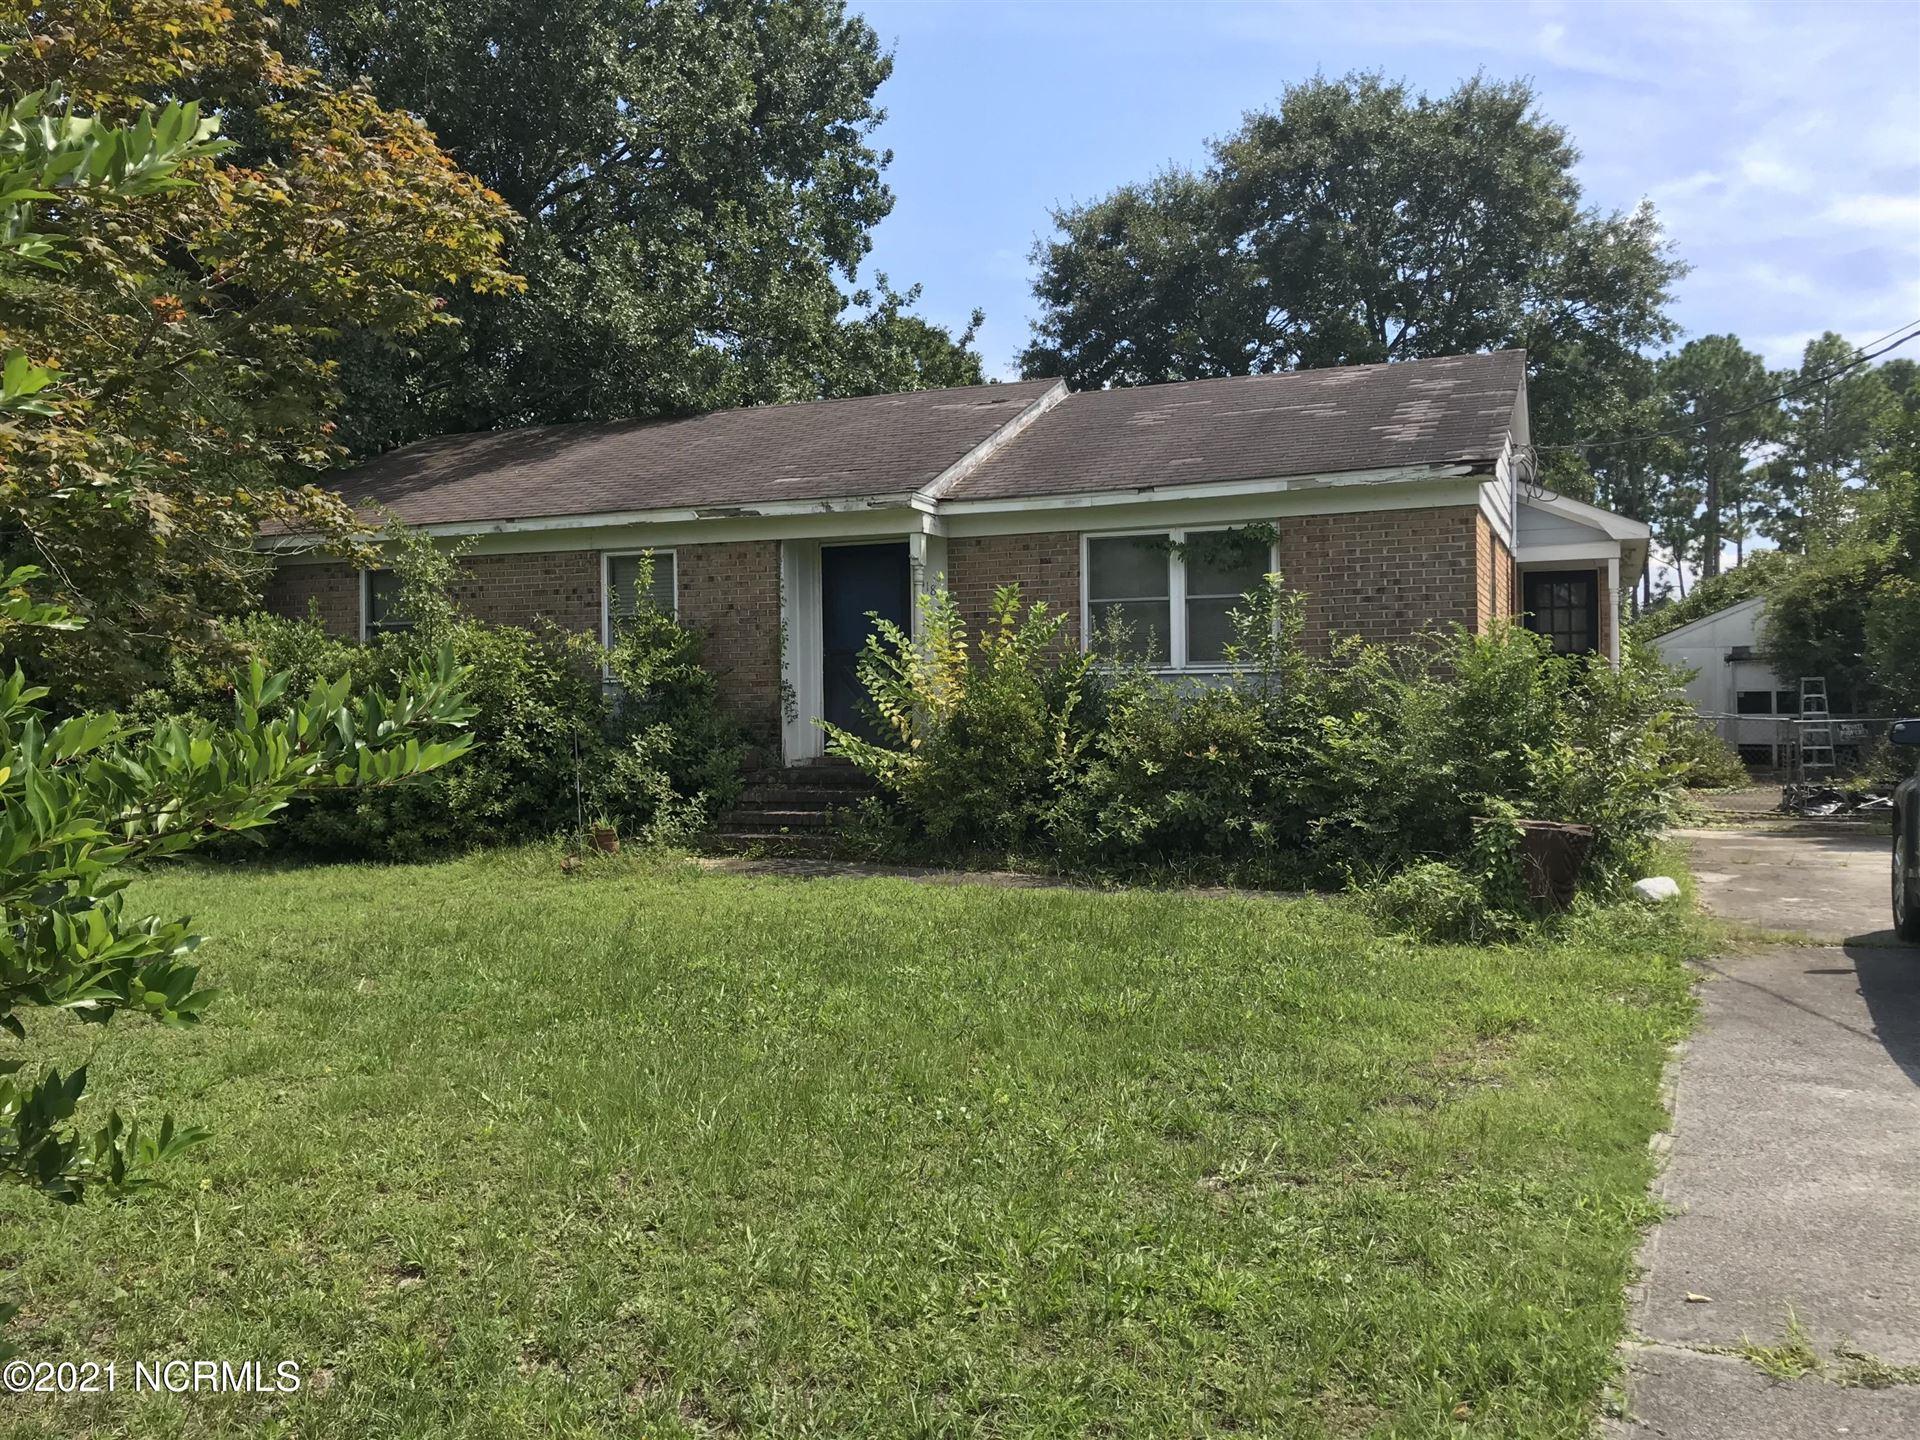 Photo of 318 N Crestwood Drive, Wilmington, NC 28405 (MLS # 100287413)